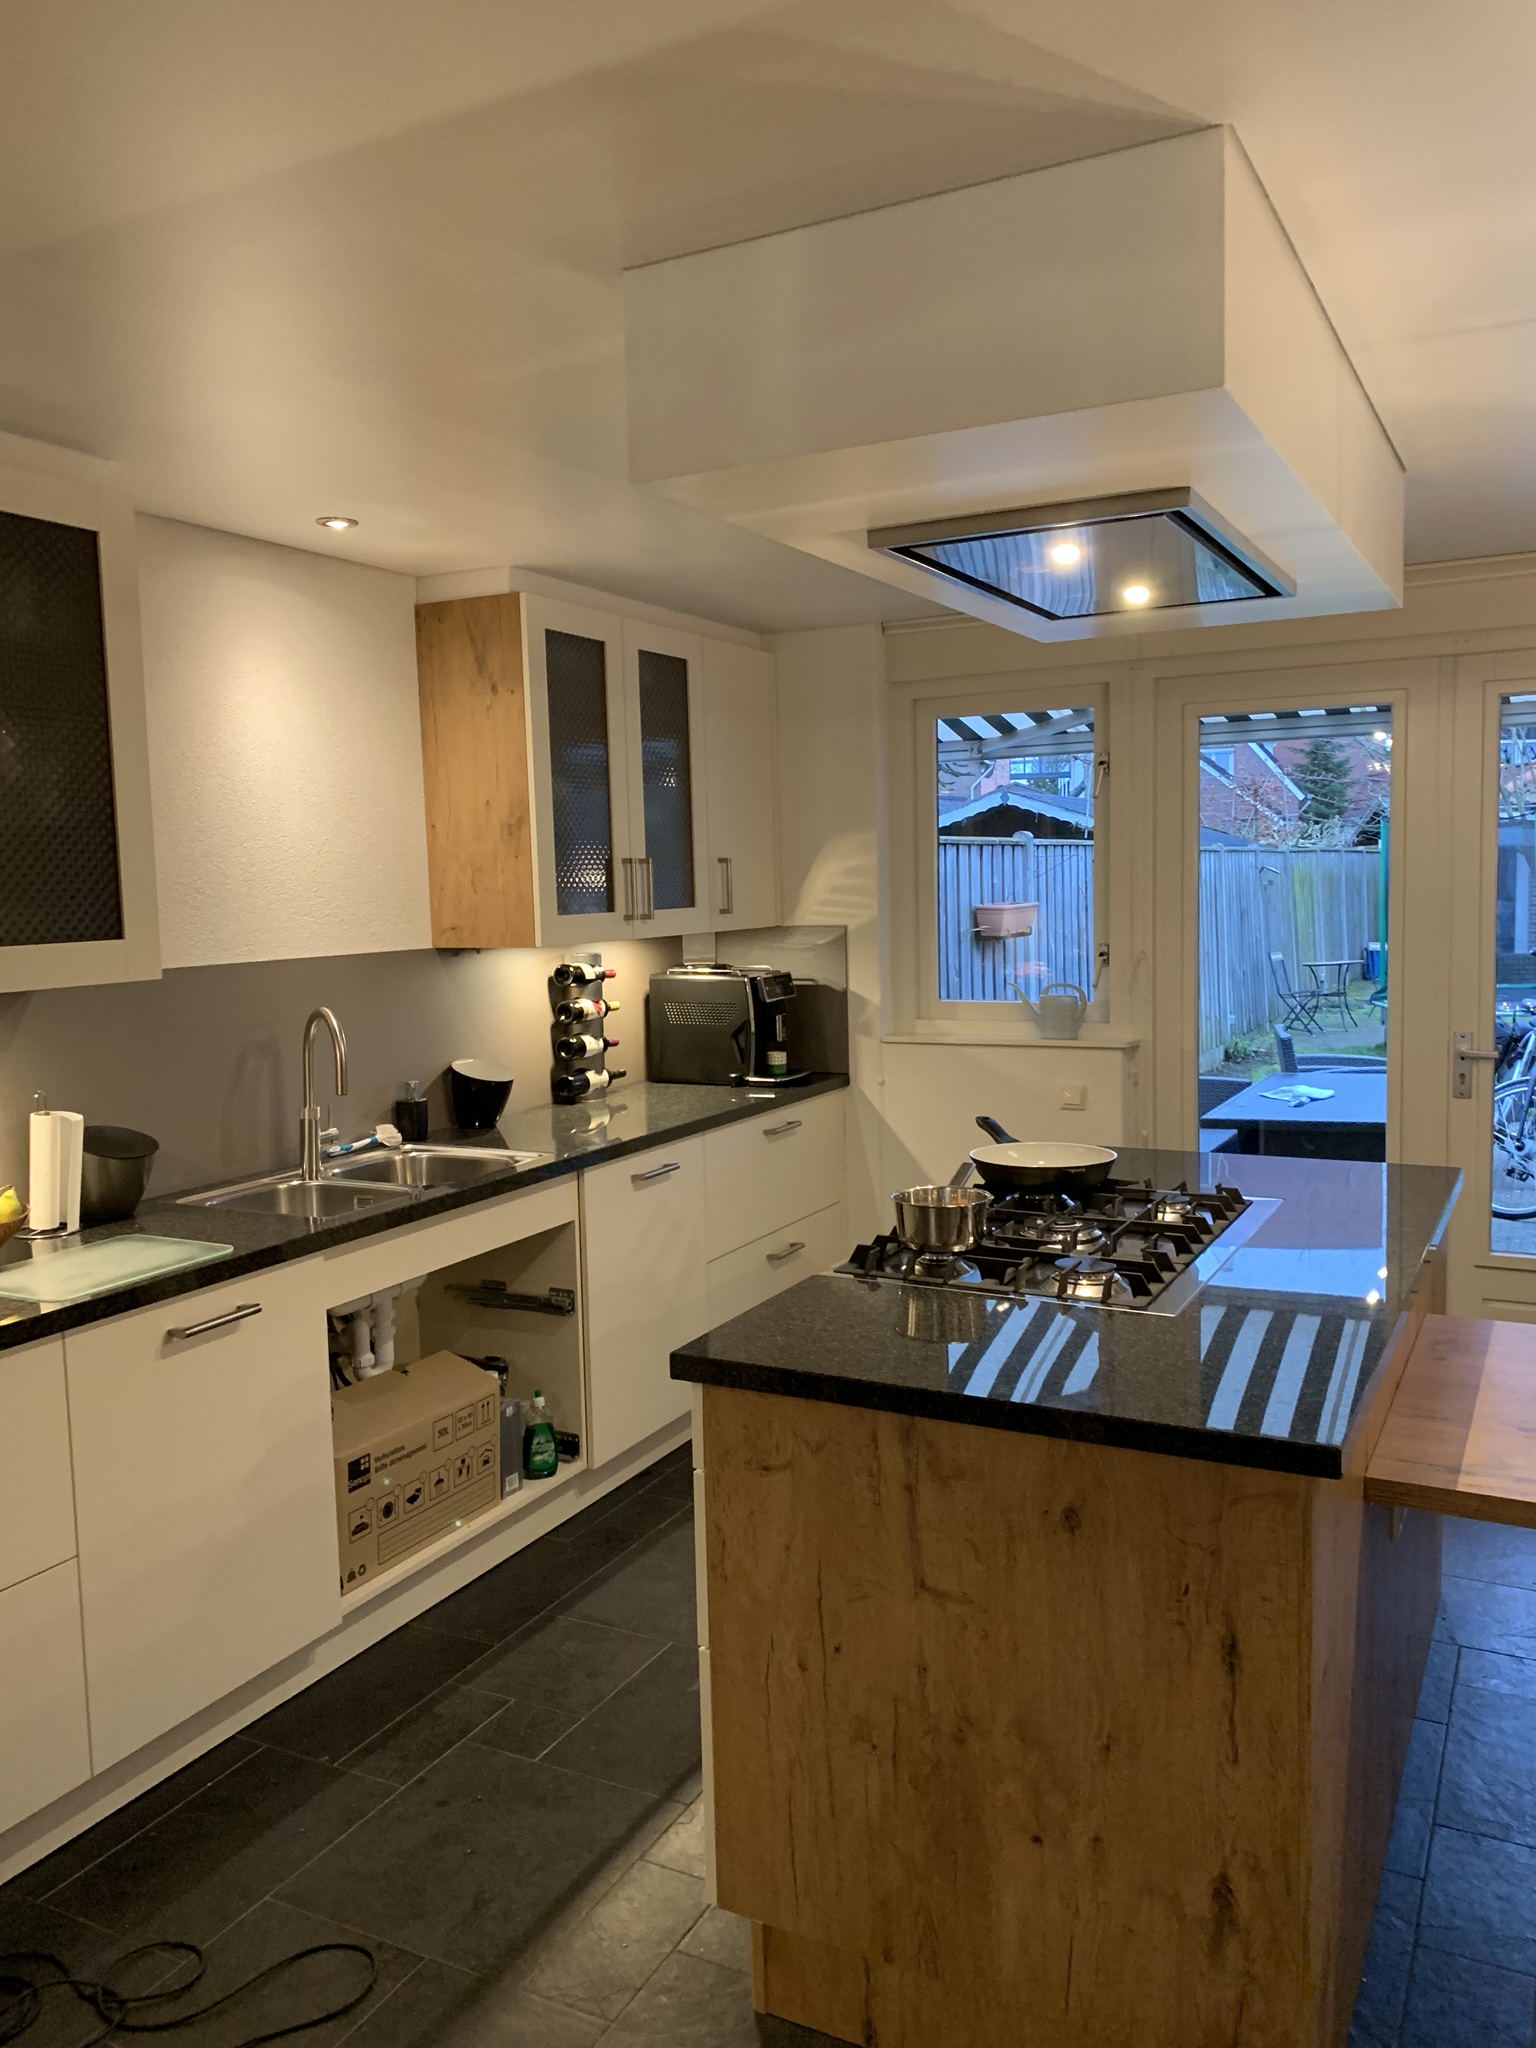 keuken plafond met verlichte spanplafond bij Indara